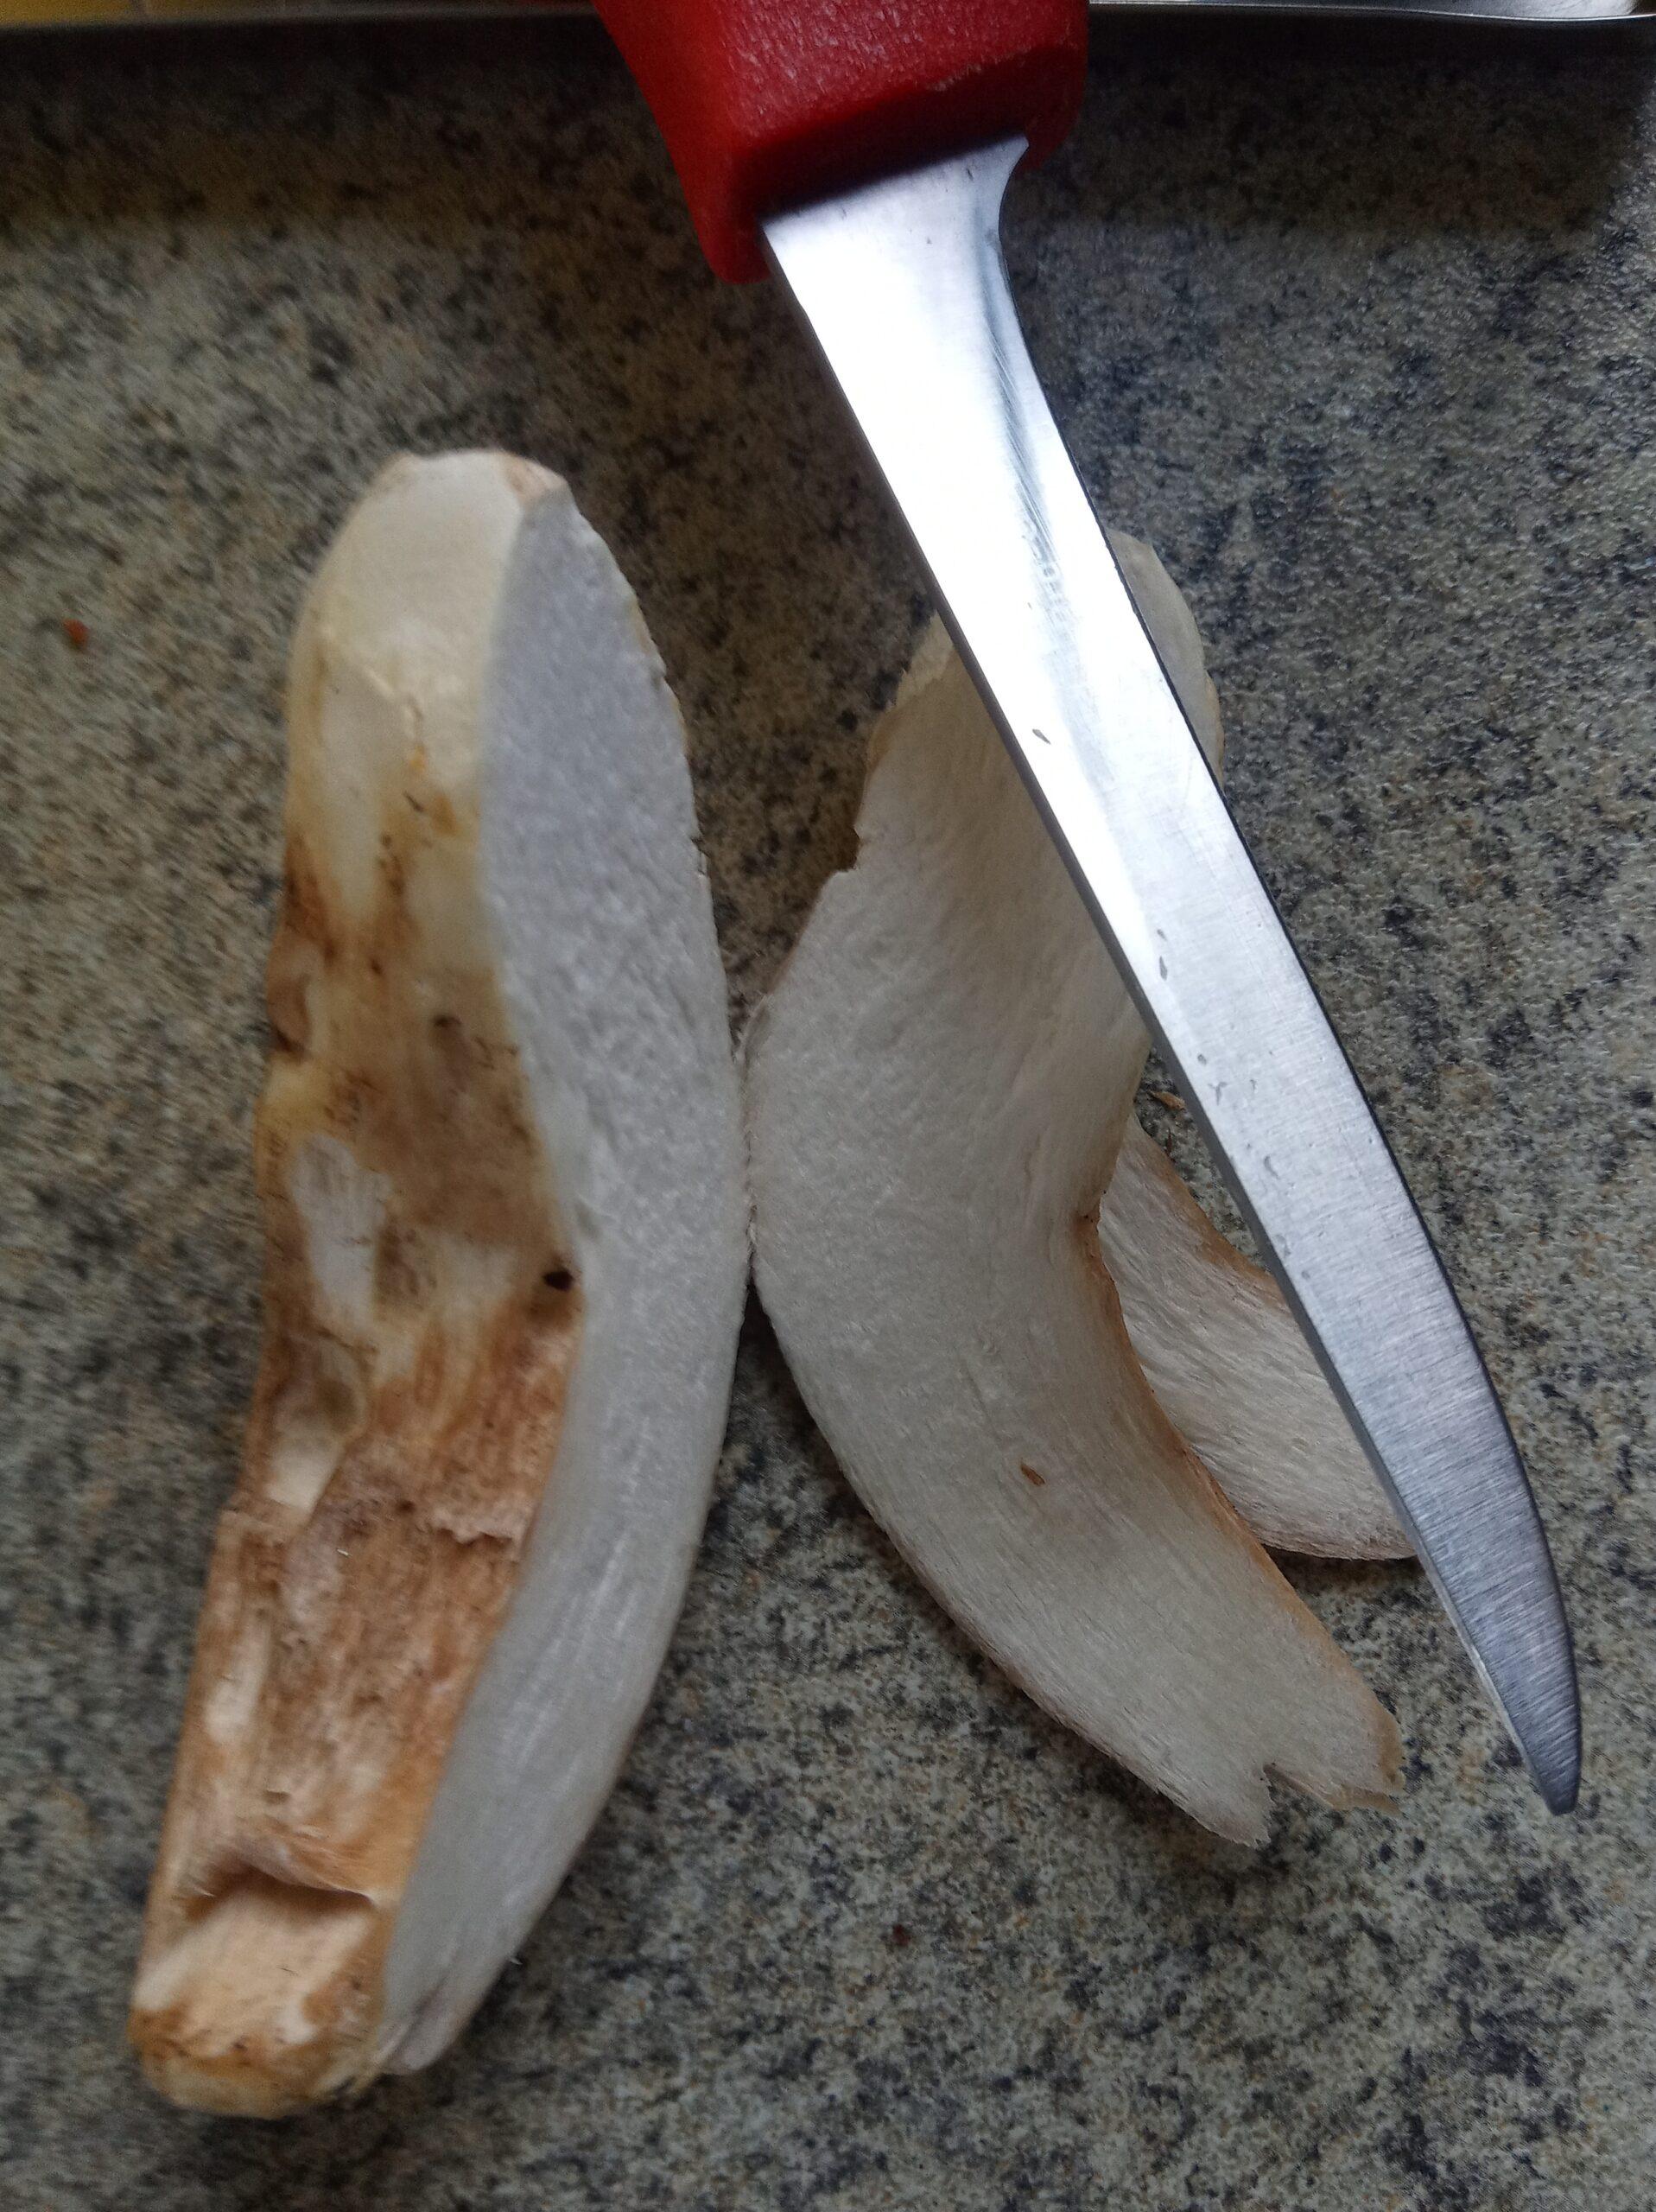 tagliare longitudinalmente  i funghi